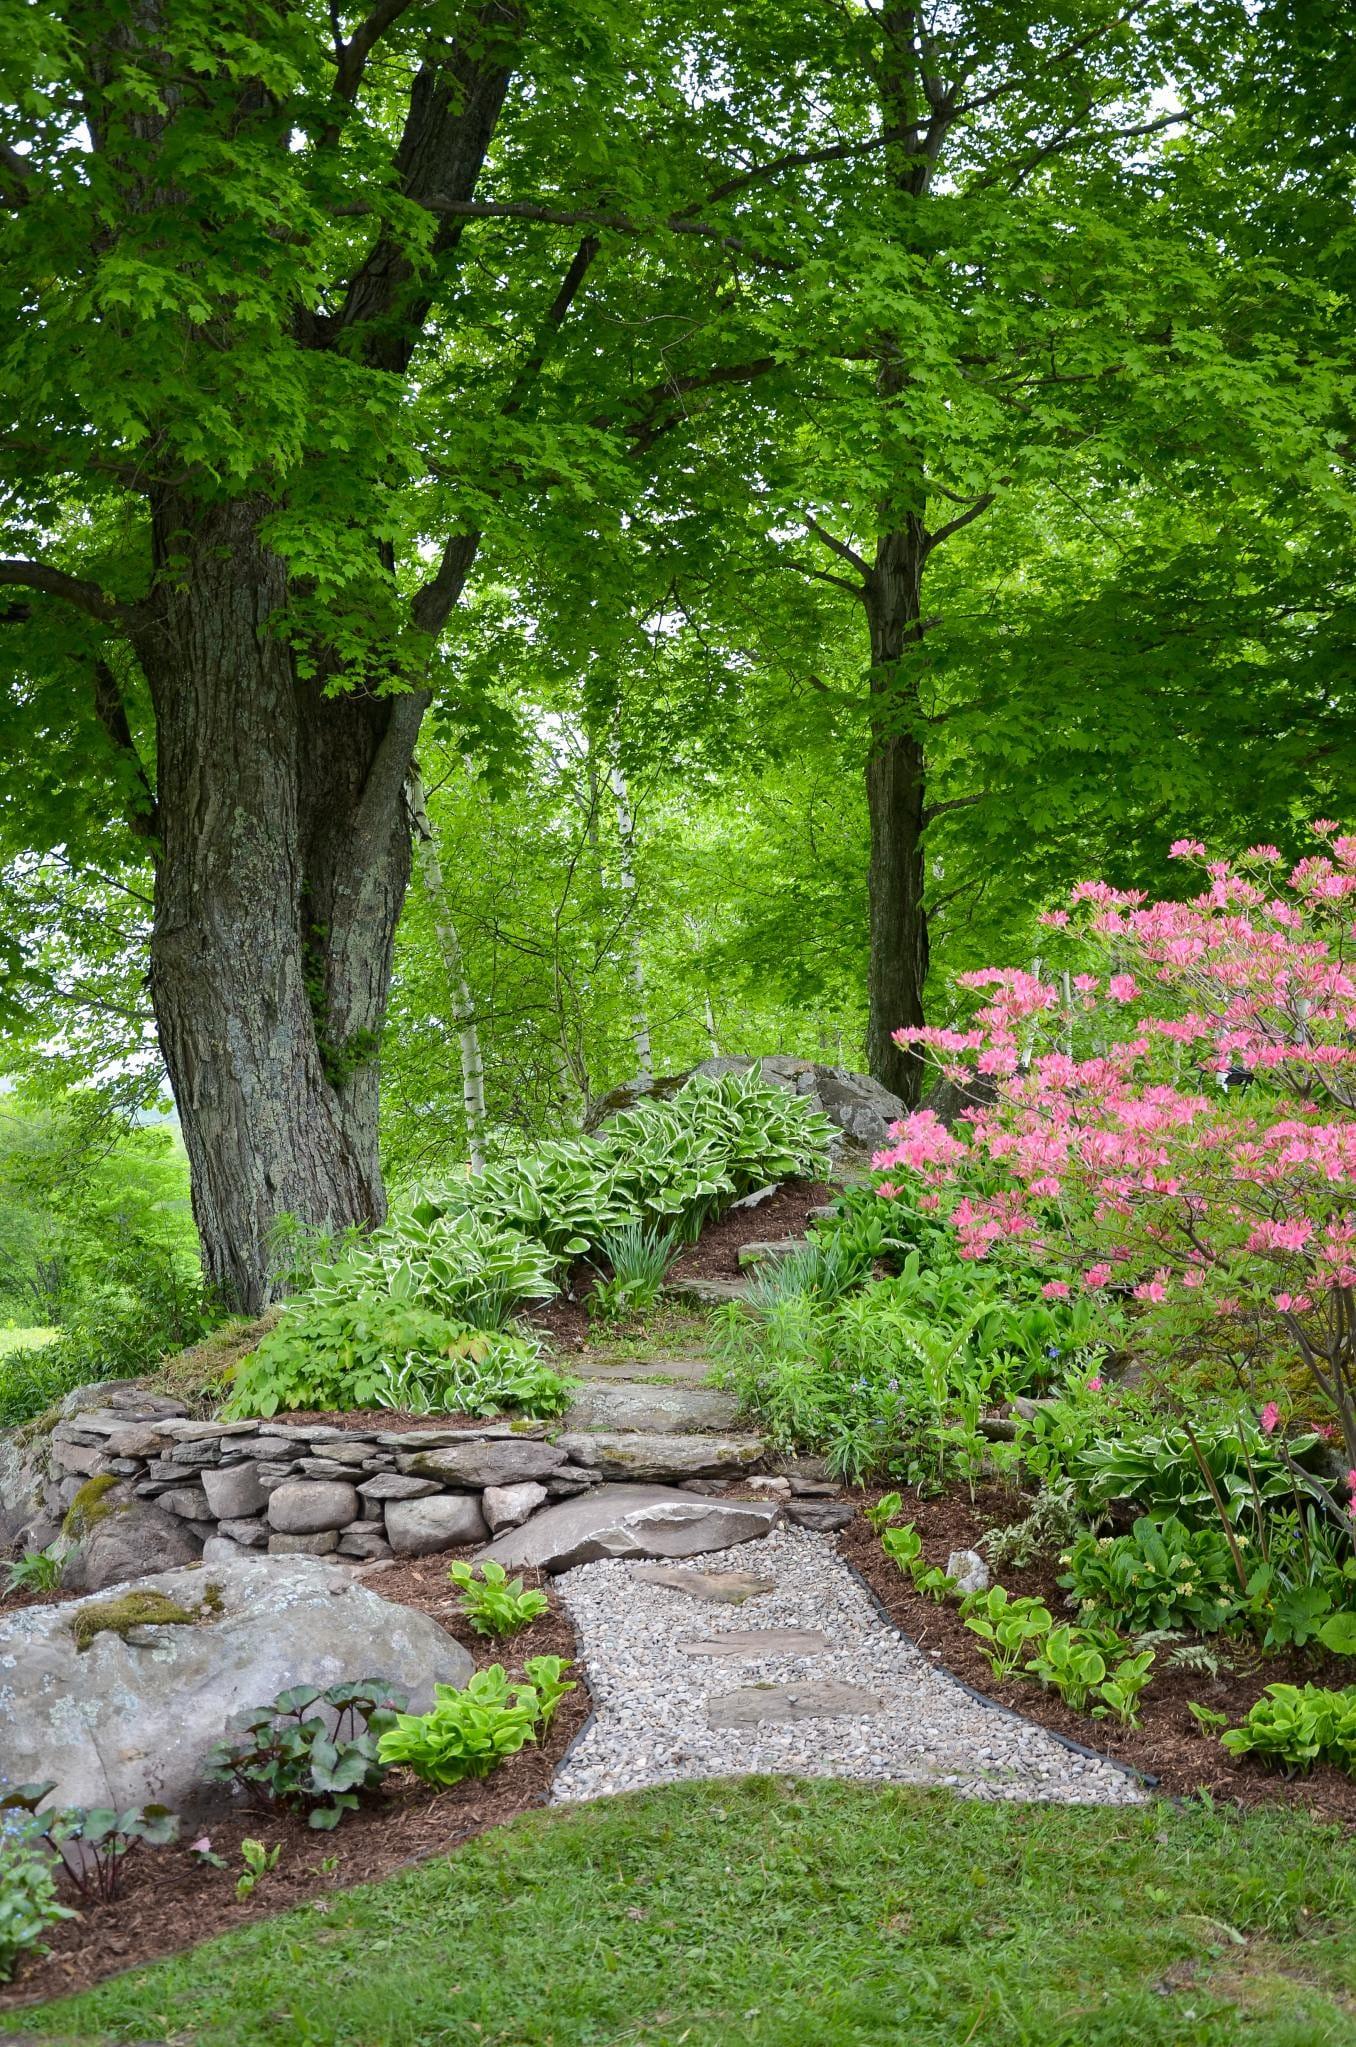 45+ Beautiful Backyard Landscaping Ideas That Will Inspire You on Beautiful Backyard Landscaping  id=53885